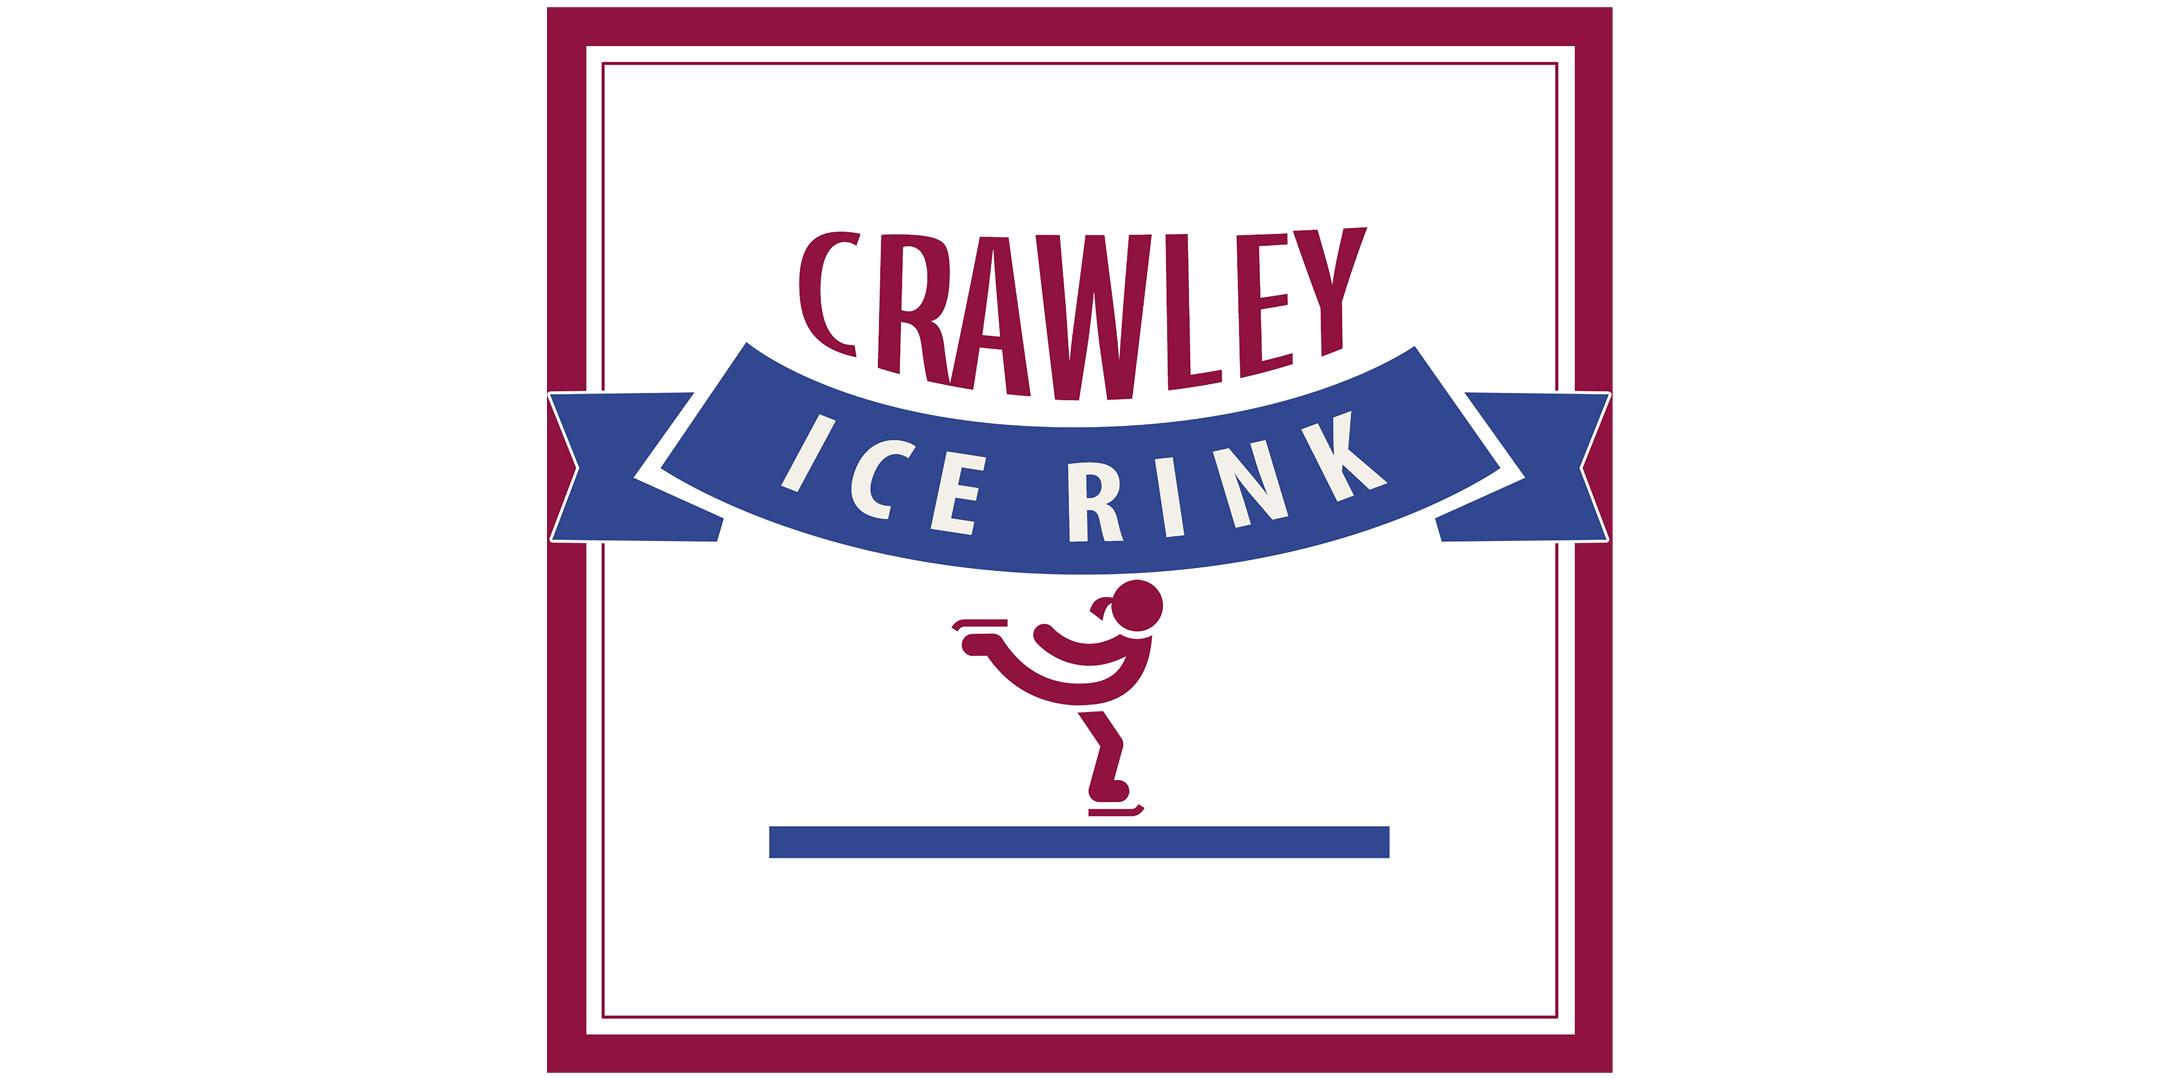 Crawley Ice Rink - 3rd December (Peak)